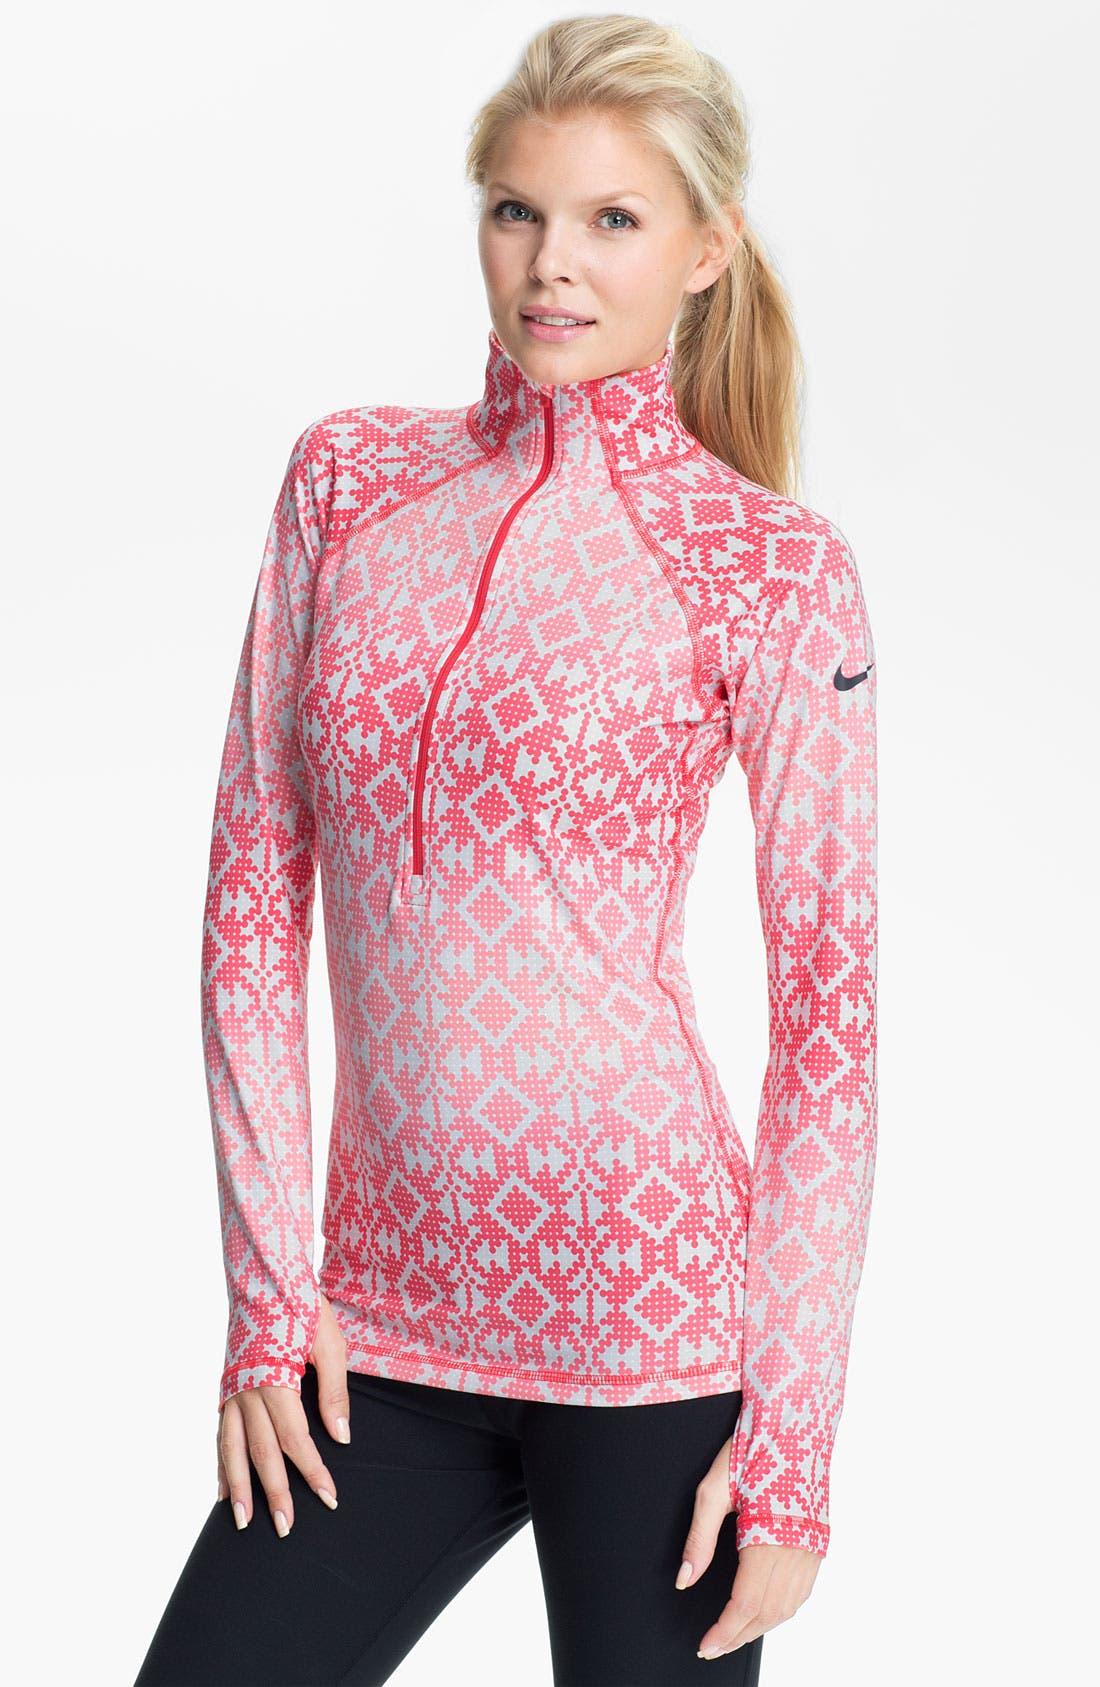 Main Image - Nike 'Pro Hyperwarm' Print Half Zip Top